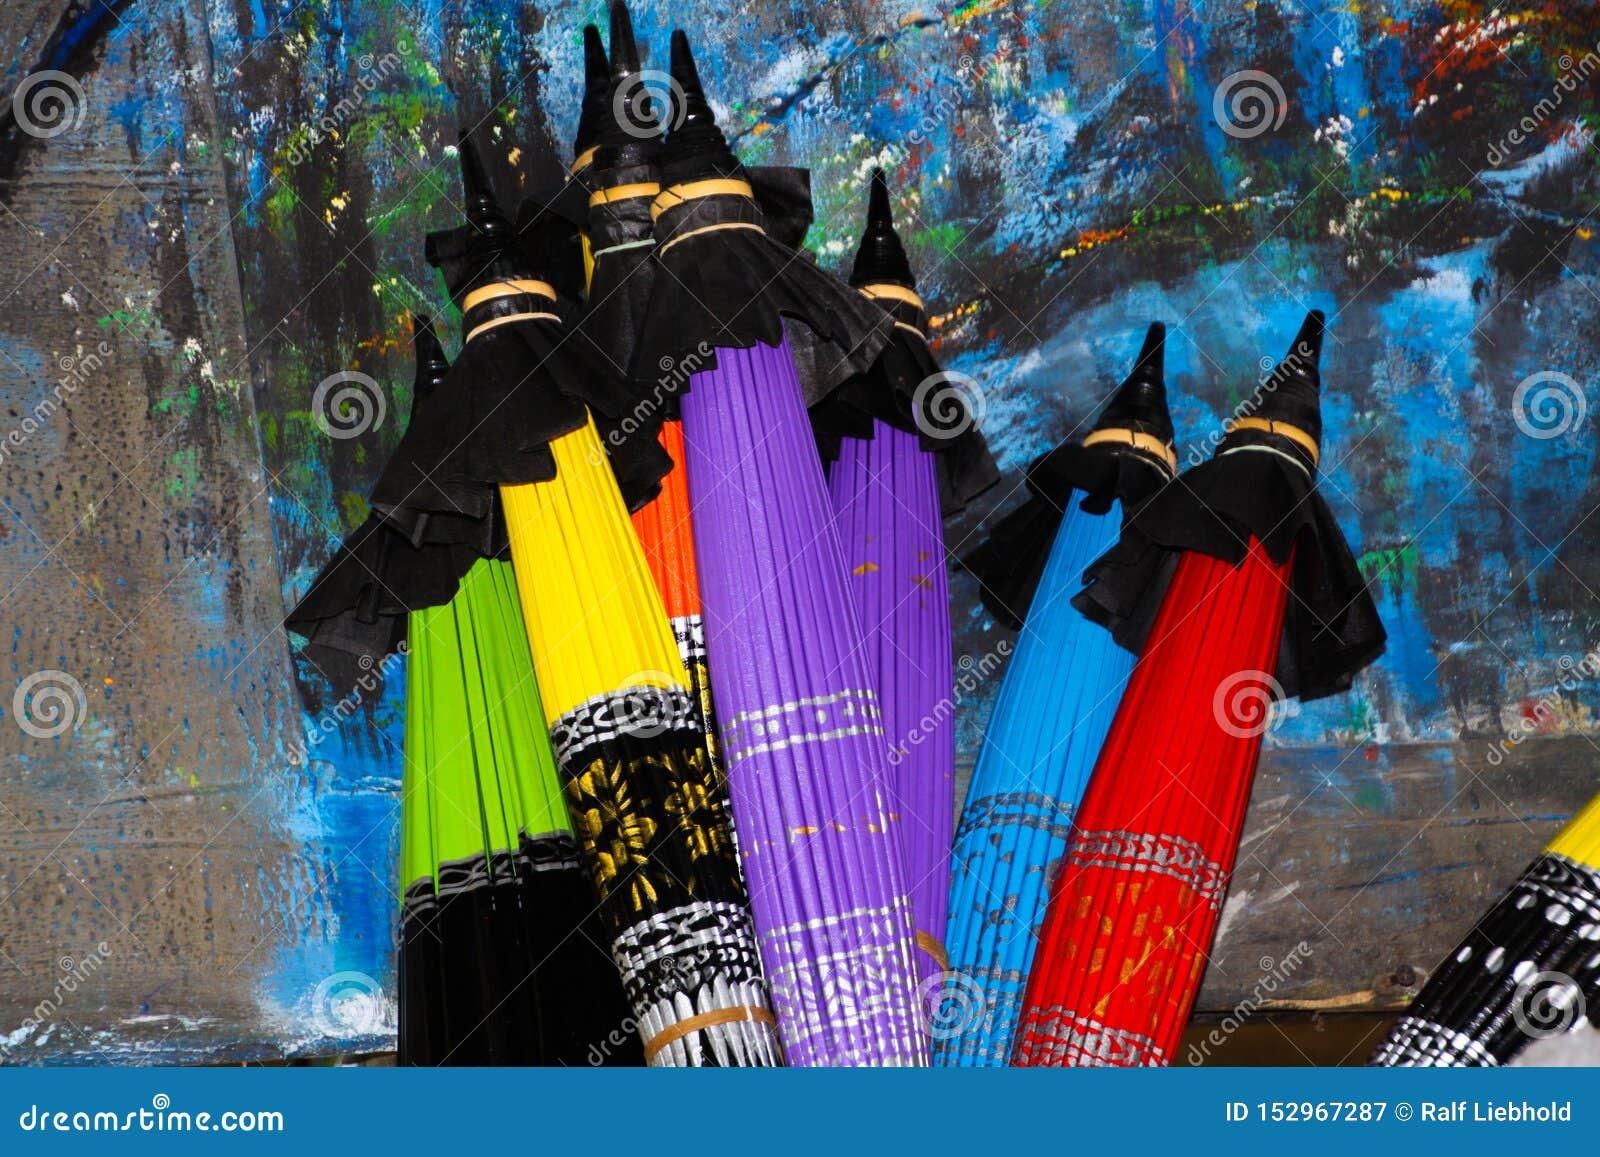 Paraguas de papel coloridos doblados que se inclinan en una pared pintada en Chiang Mai, Tailandia